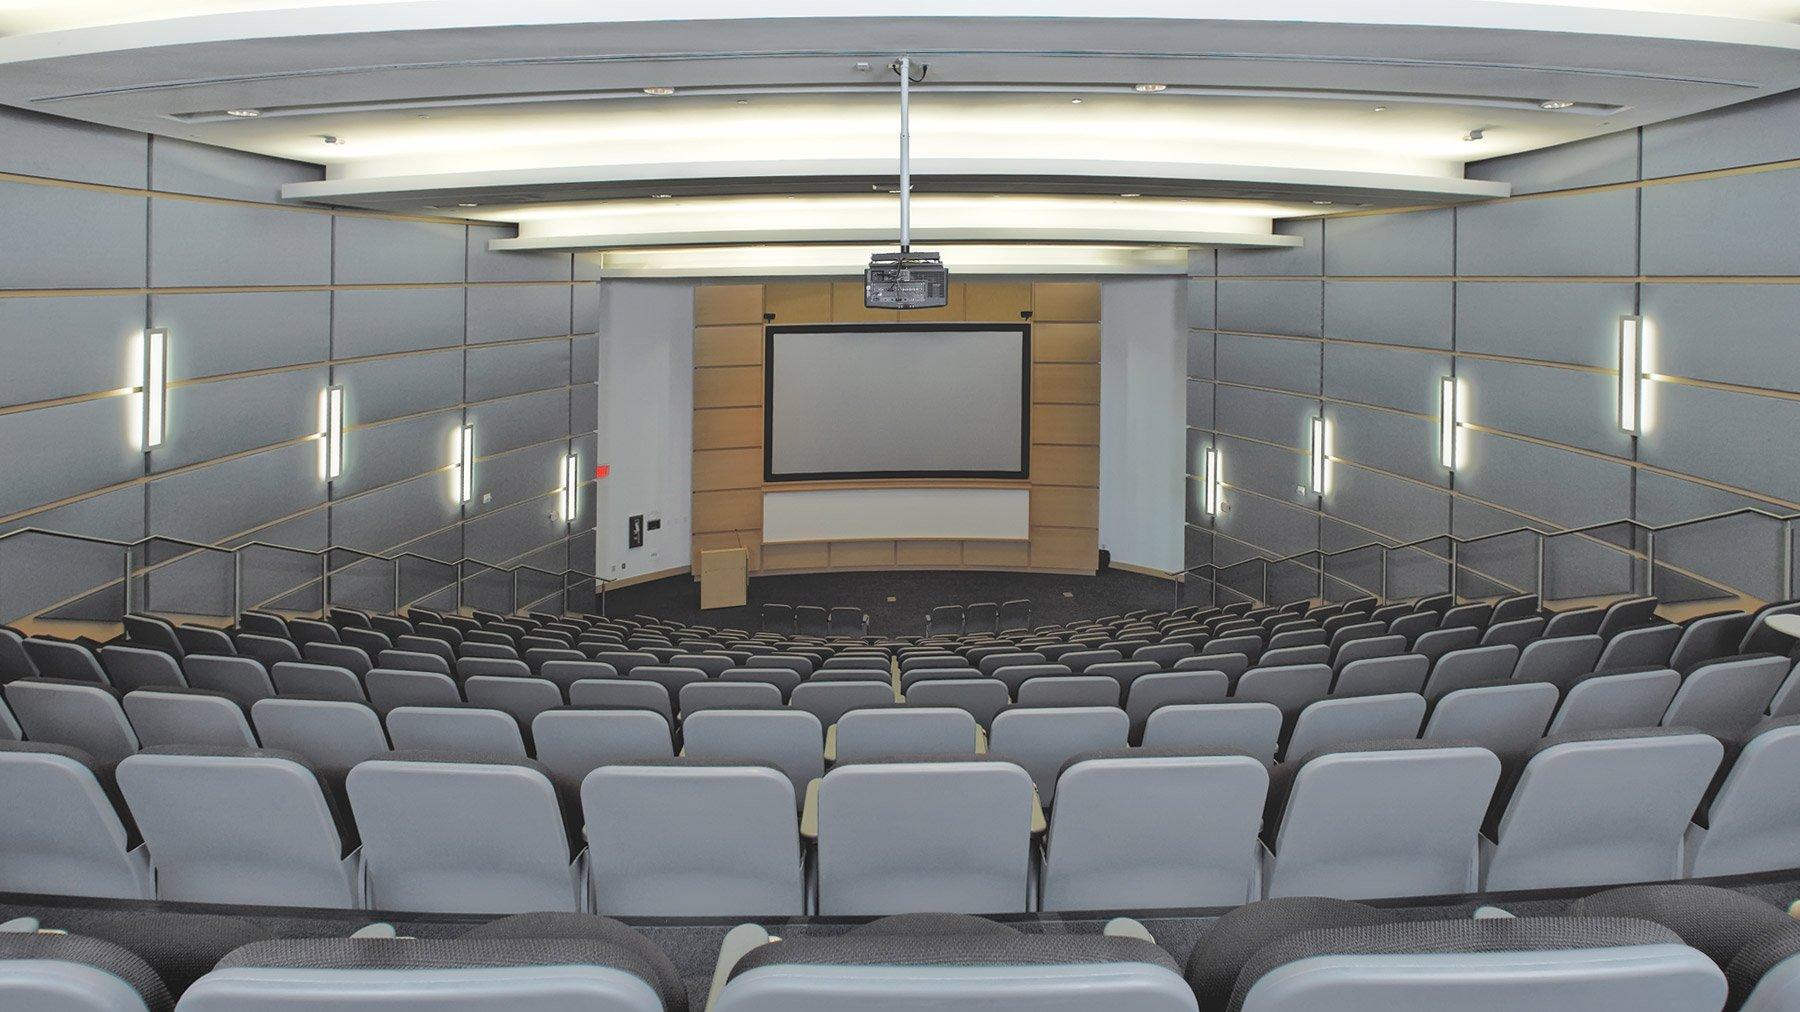 Joint School of Nanoscience and Nanoengineering Building